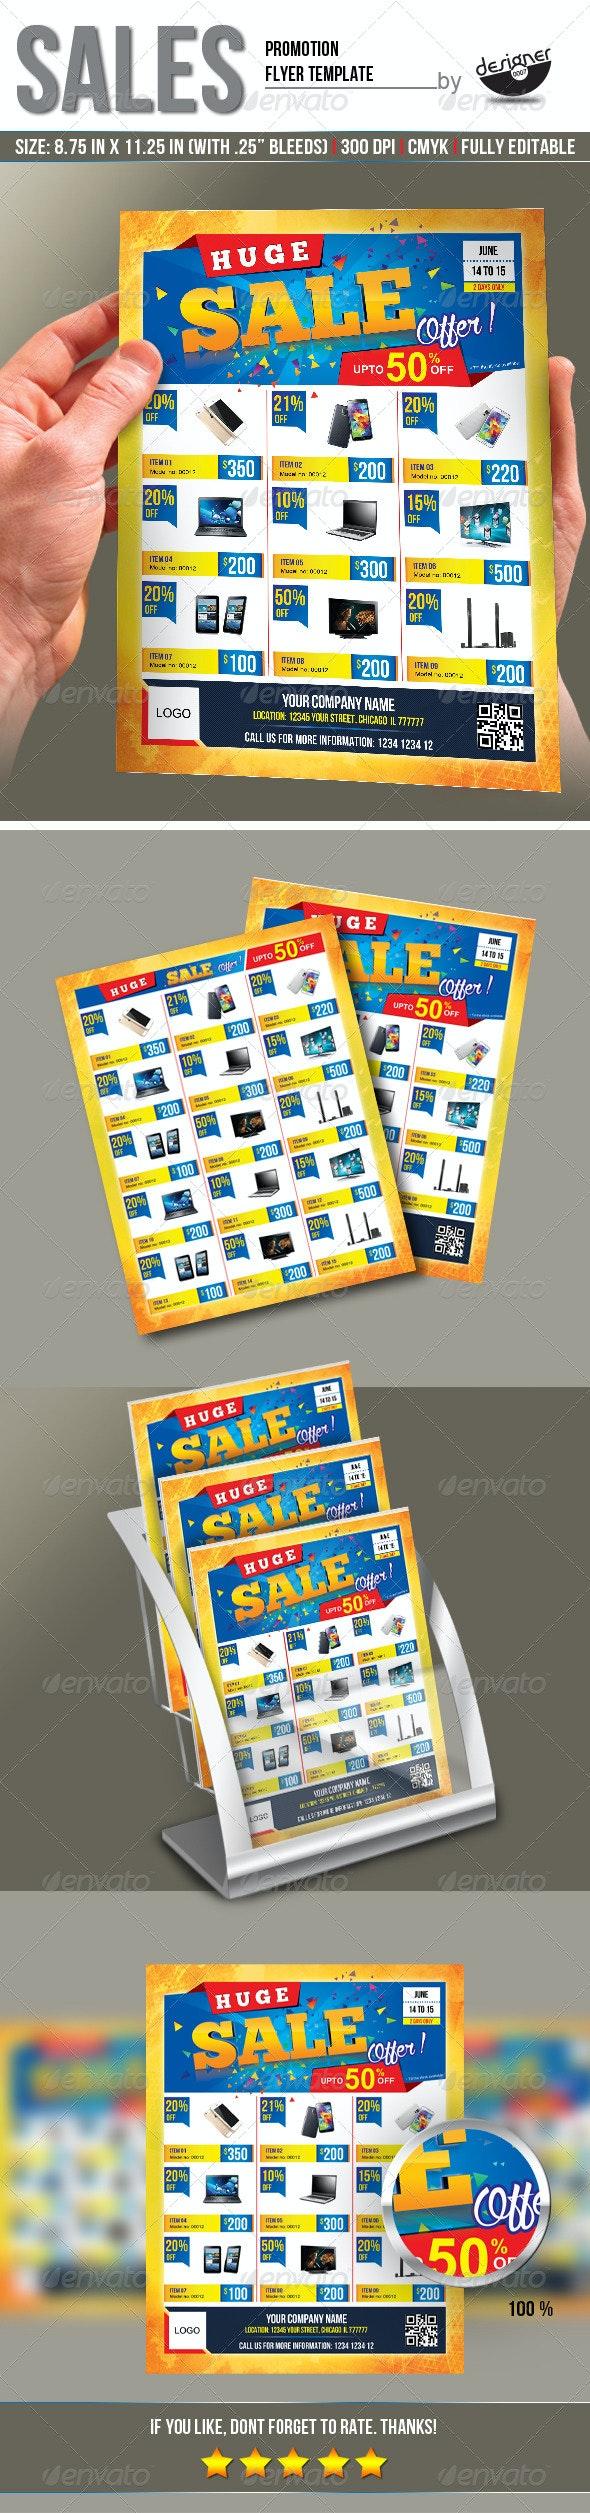 Sales Promotion Flyer Template - Commerce Flyers